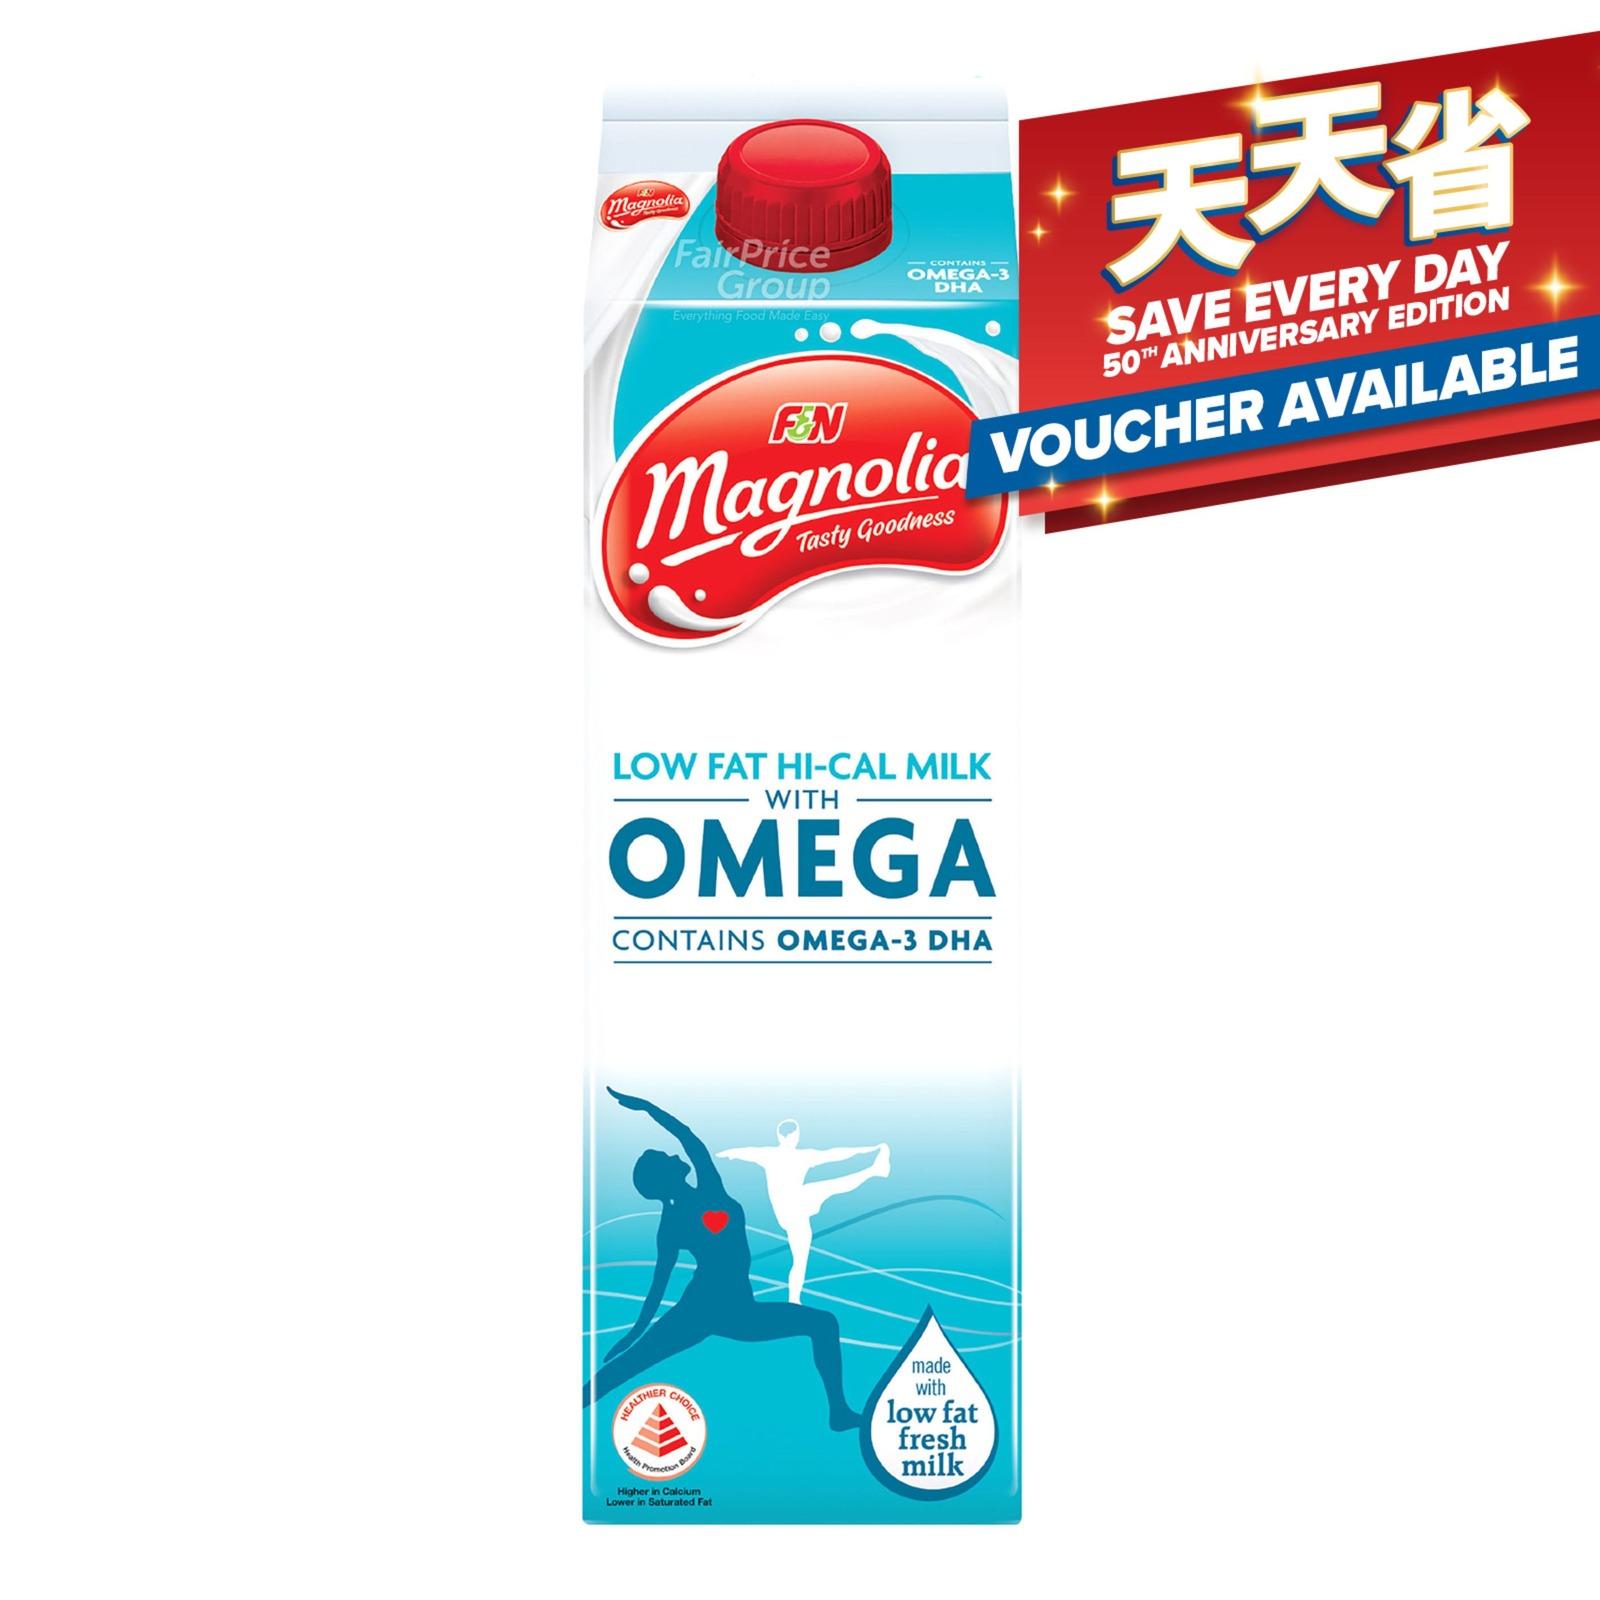 F&N Magnolia Plus Lo-Fat Hi-Cal Milk - Omega